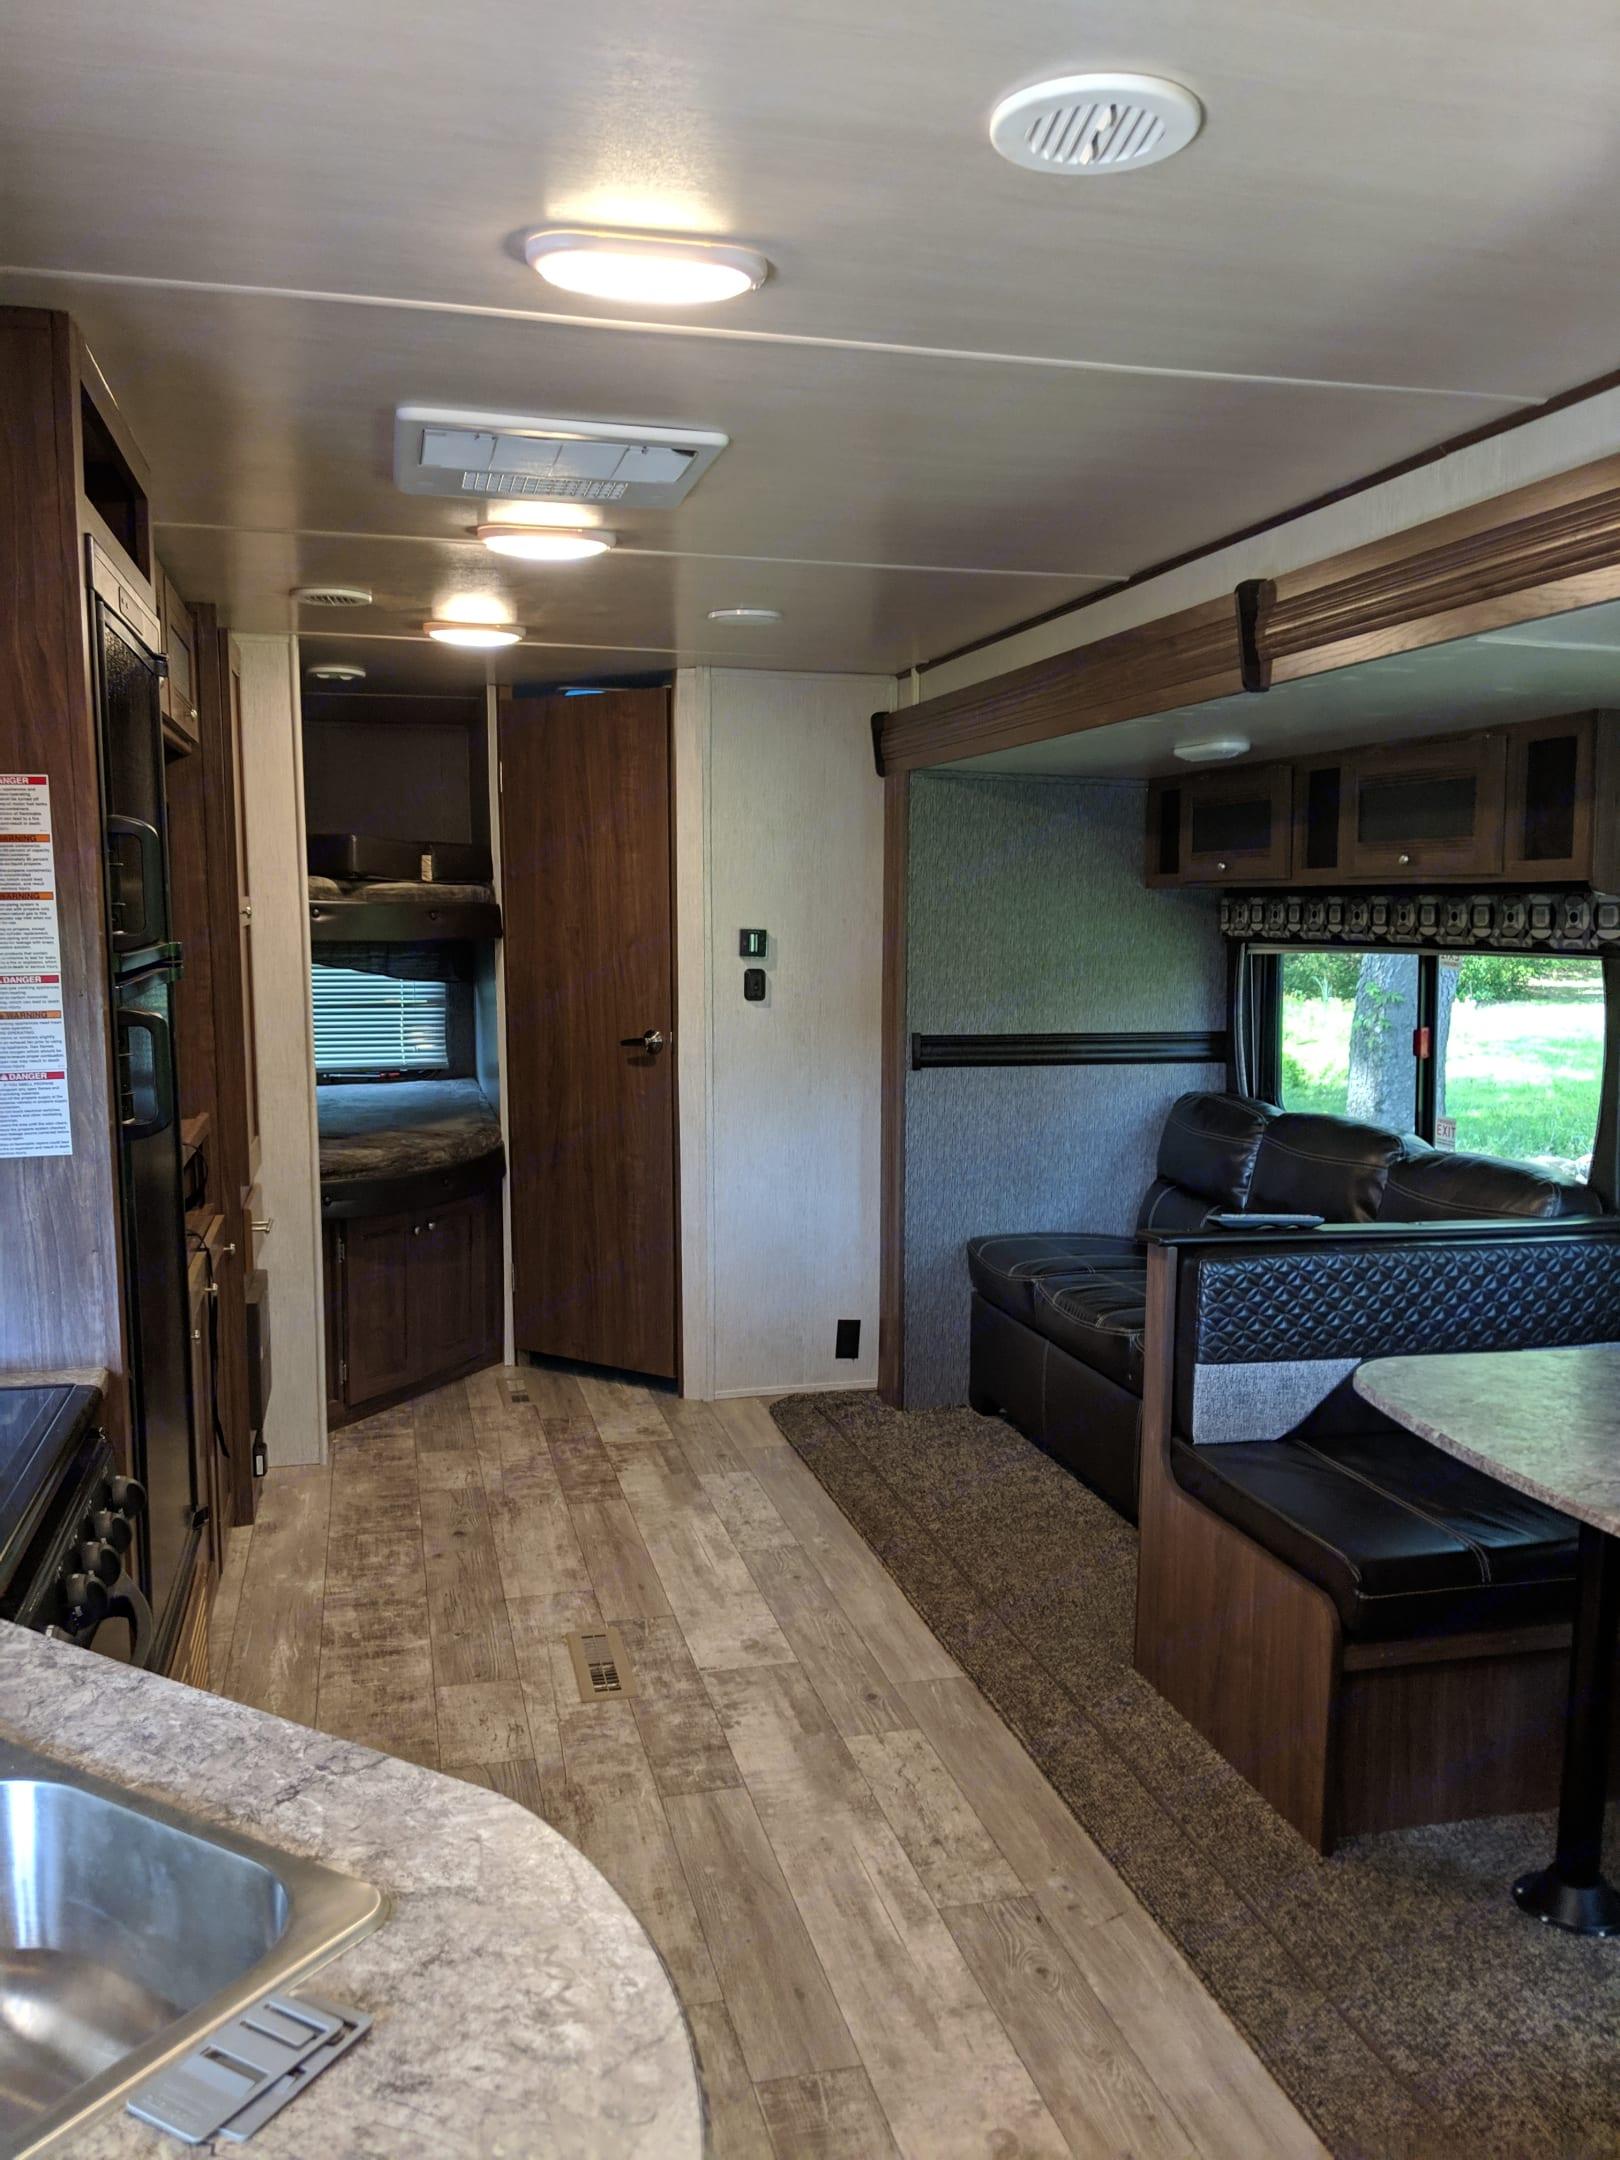 Living Space - 2 bunks on left. Heartland Pioneer 2019